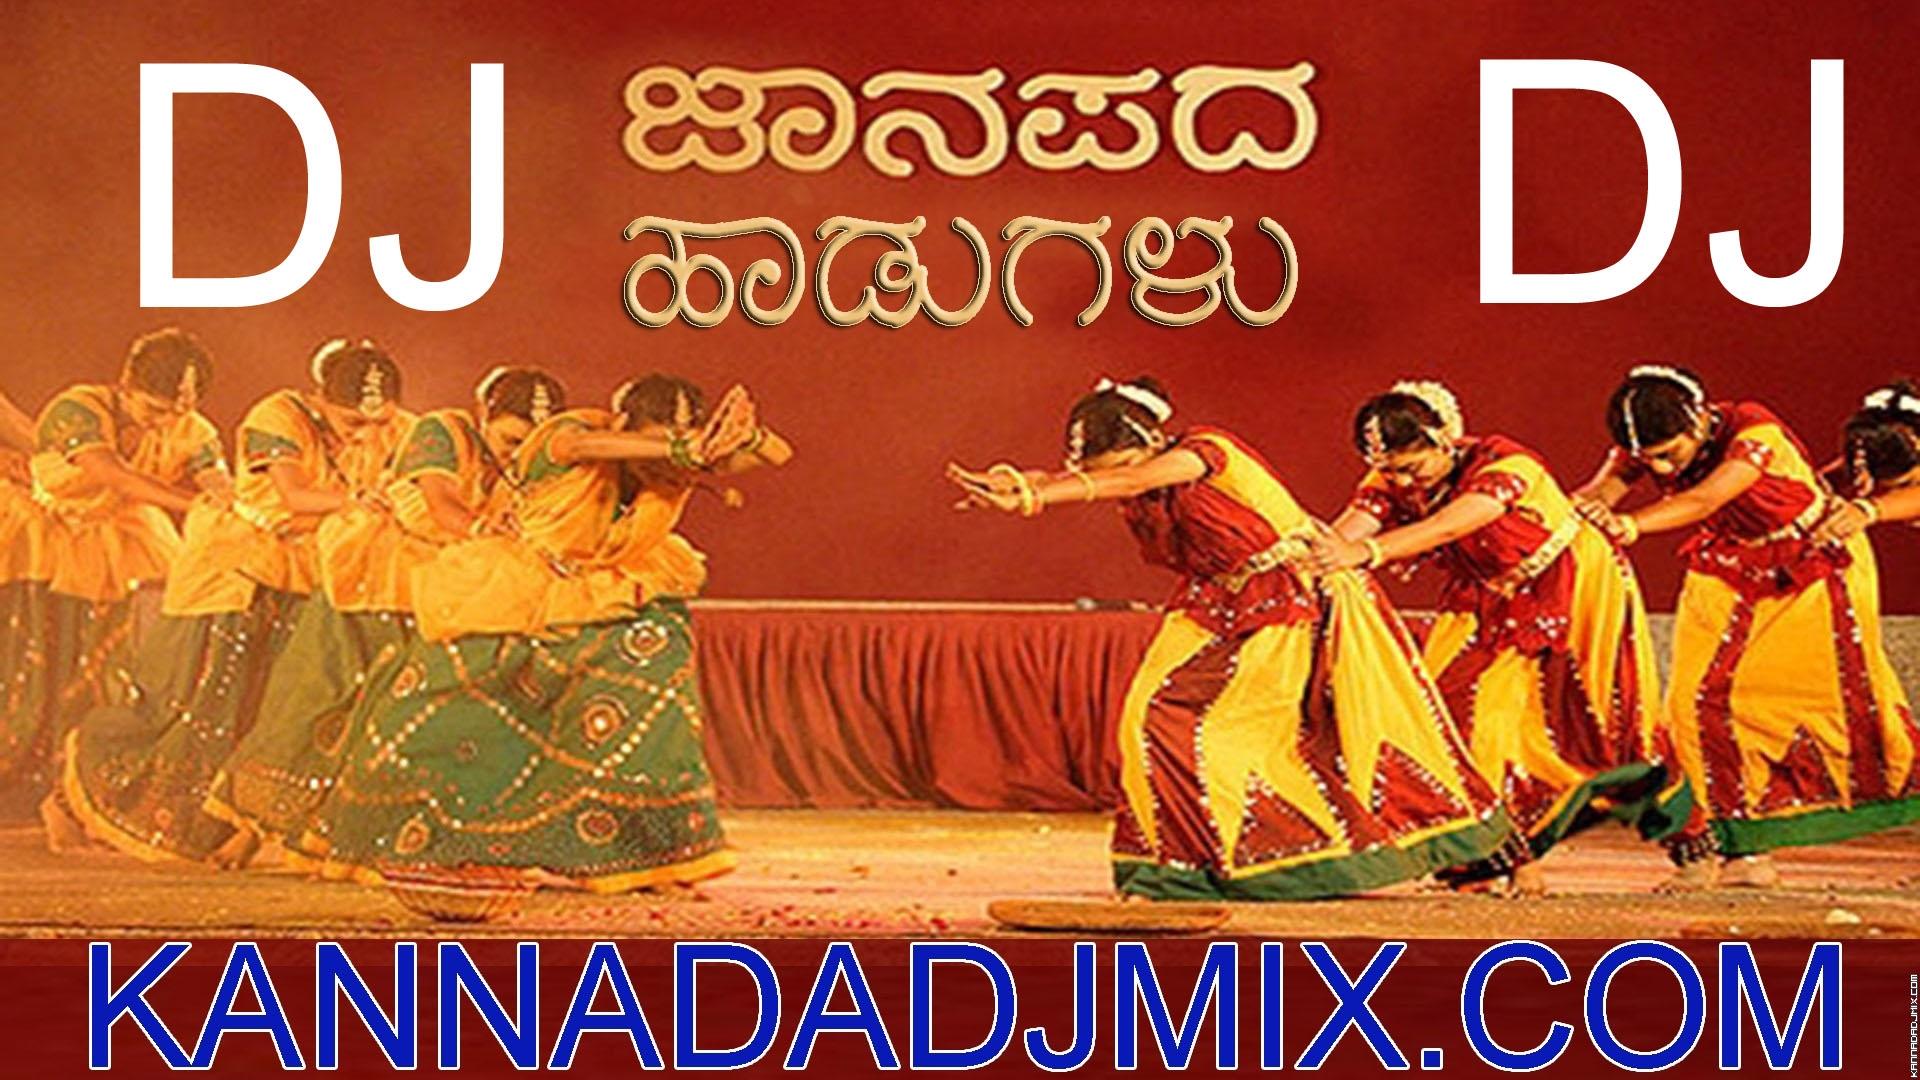 NAMMA HUDGID MYAGINA ONI(ನಮ್ಮ ಹುಡುಗಿದ ಮ್ಯಾಗಿನ ಓಣಿ)JANAPDA DJ SONG  MIX BY DJ GAIBU TDL.mp3